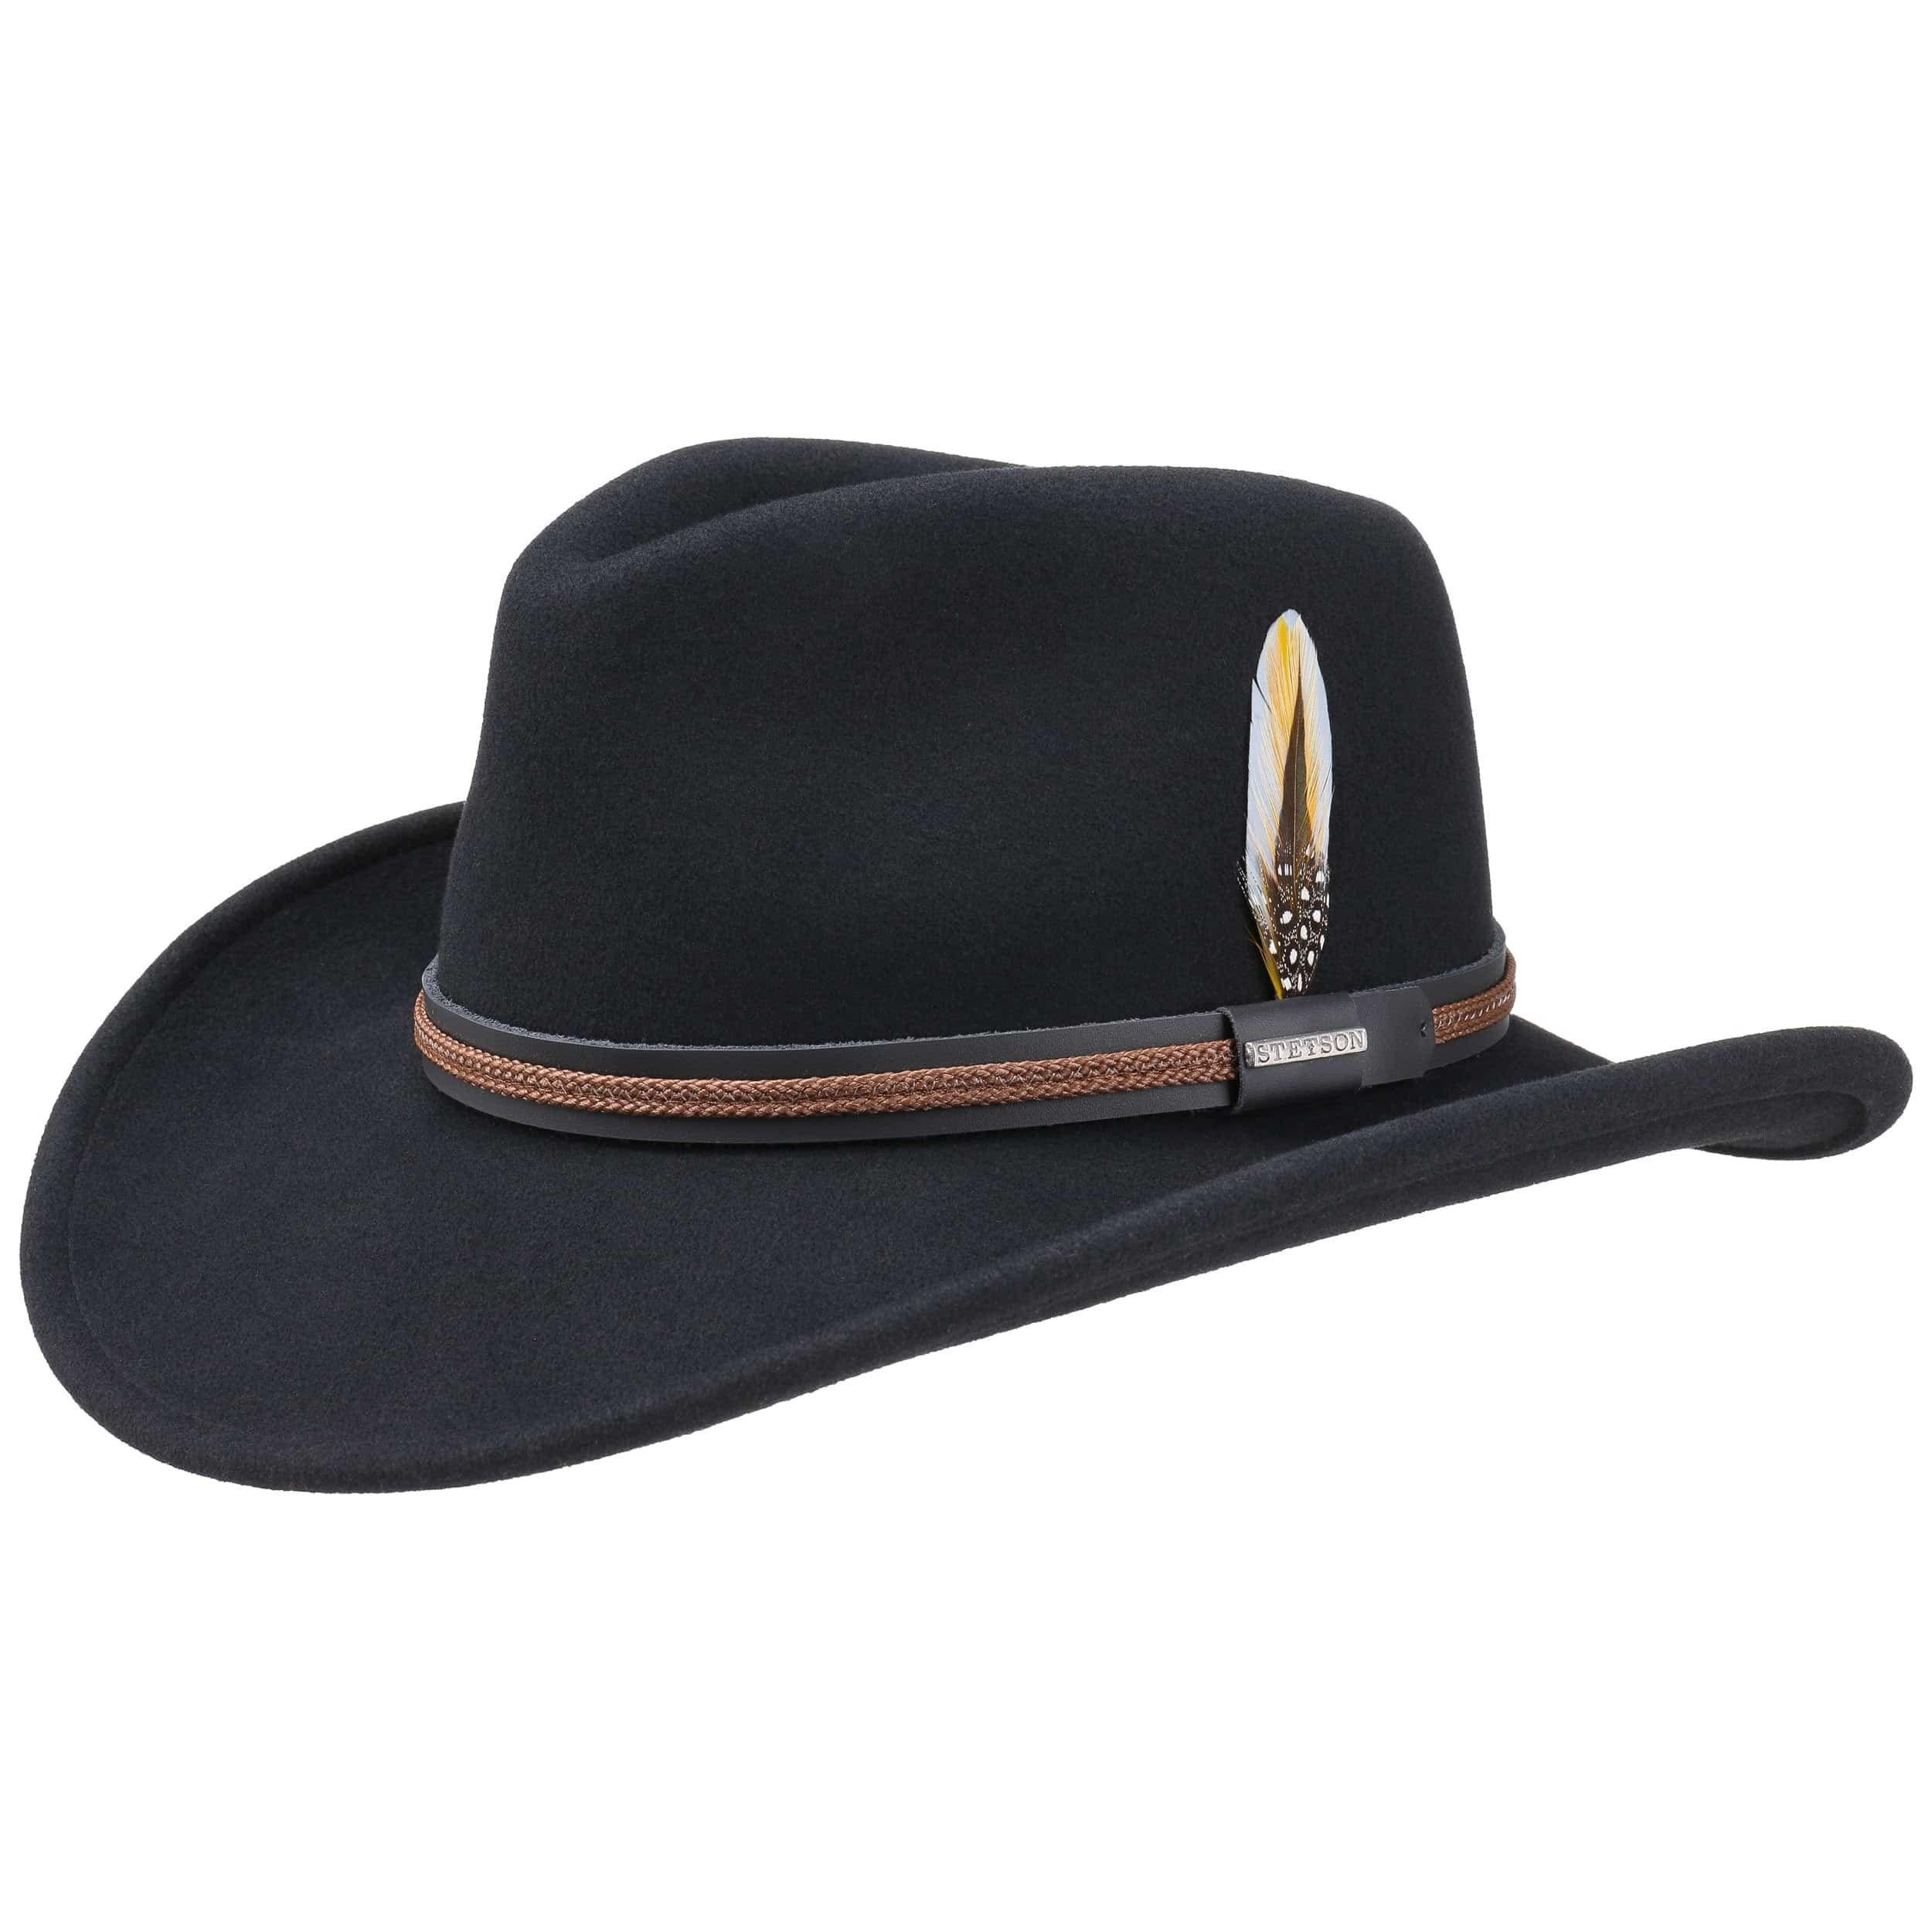 Chasney Western VitaFelt Hat black